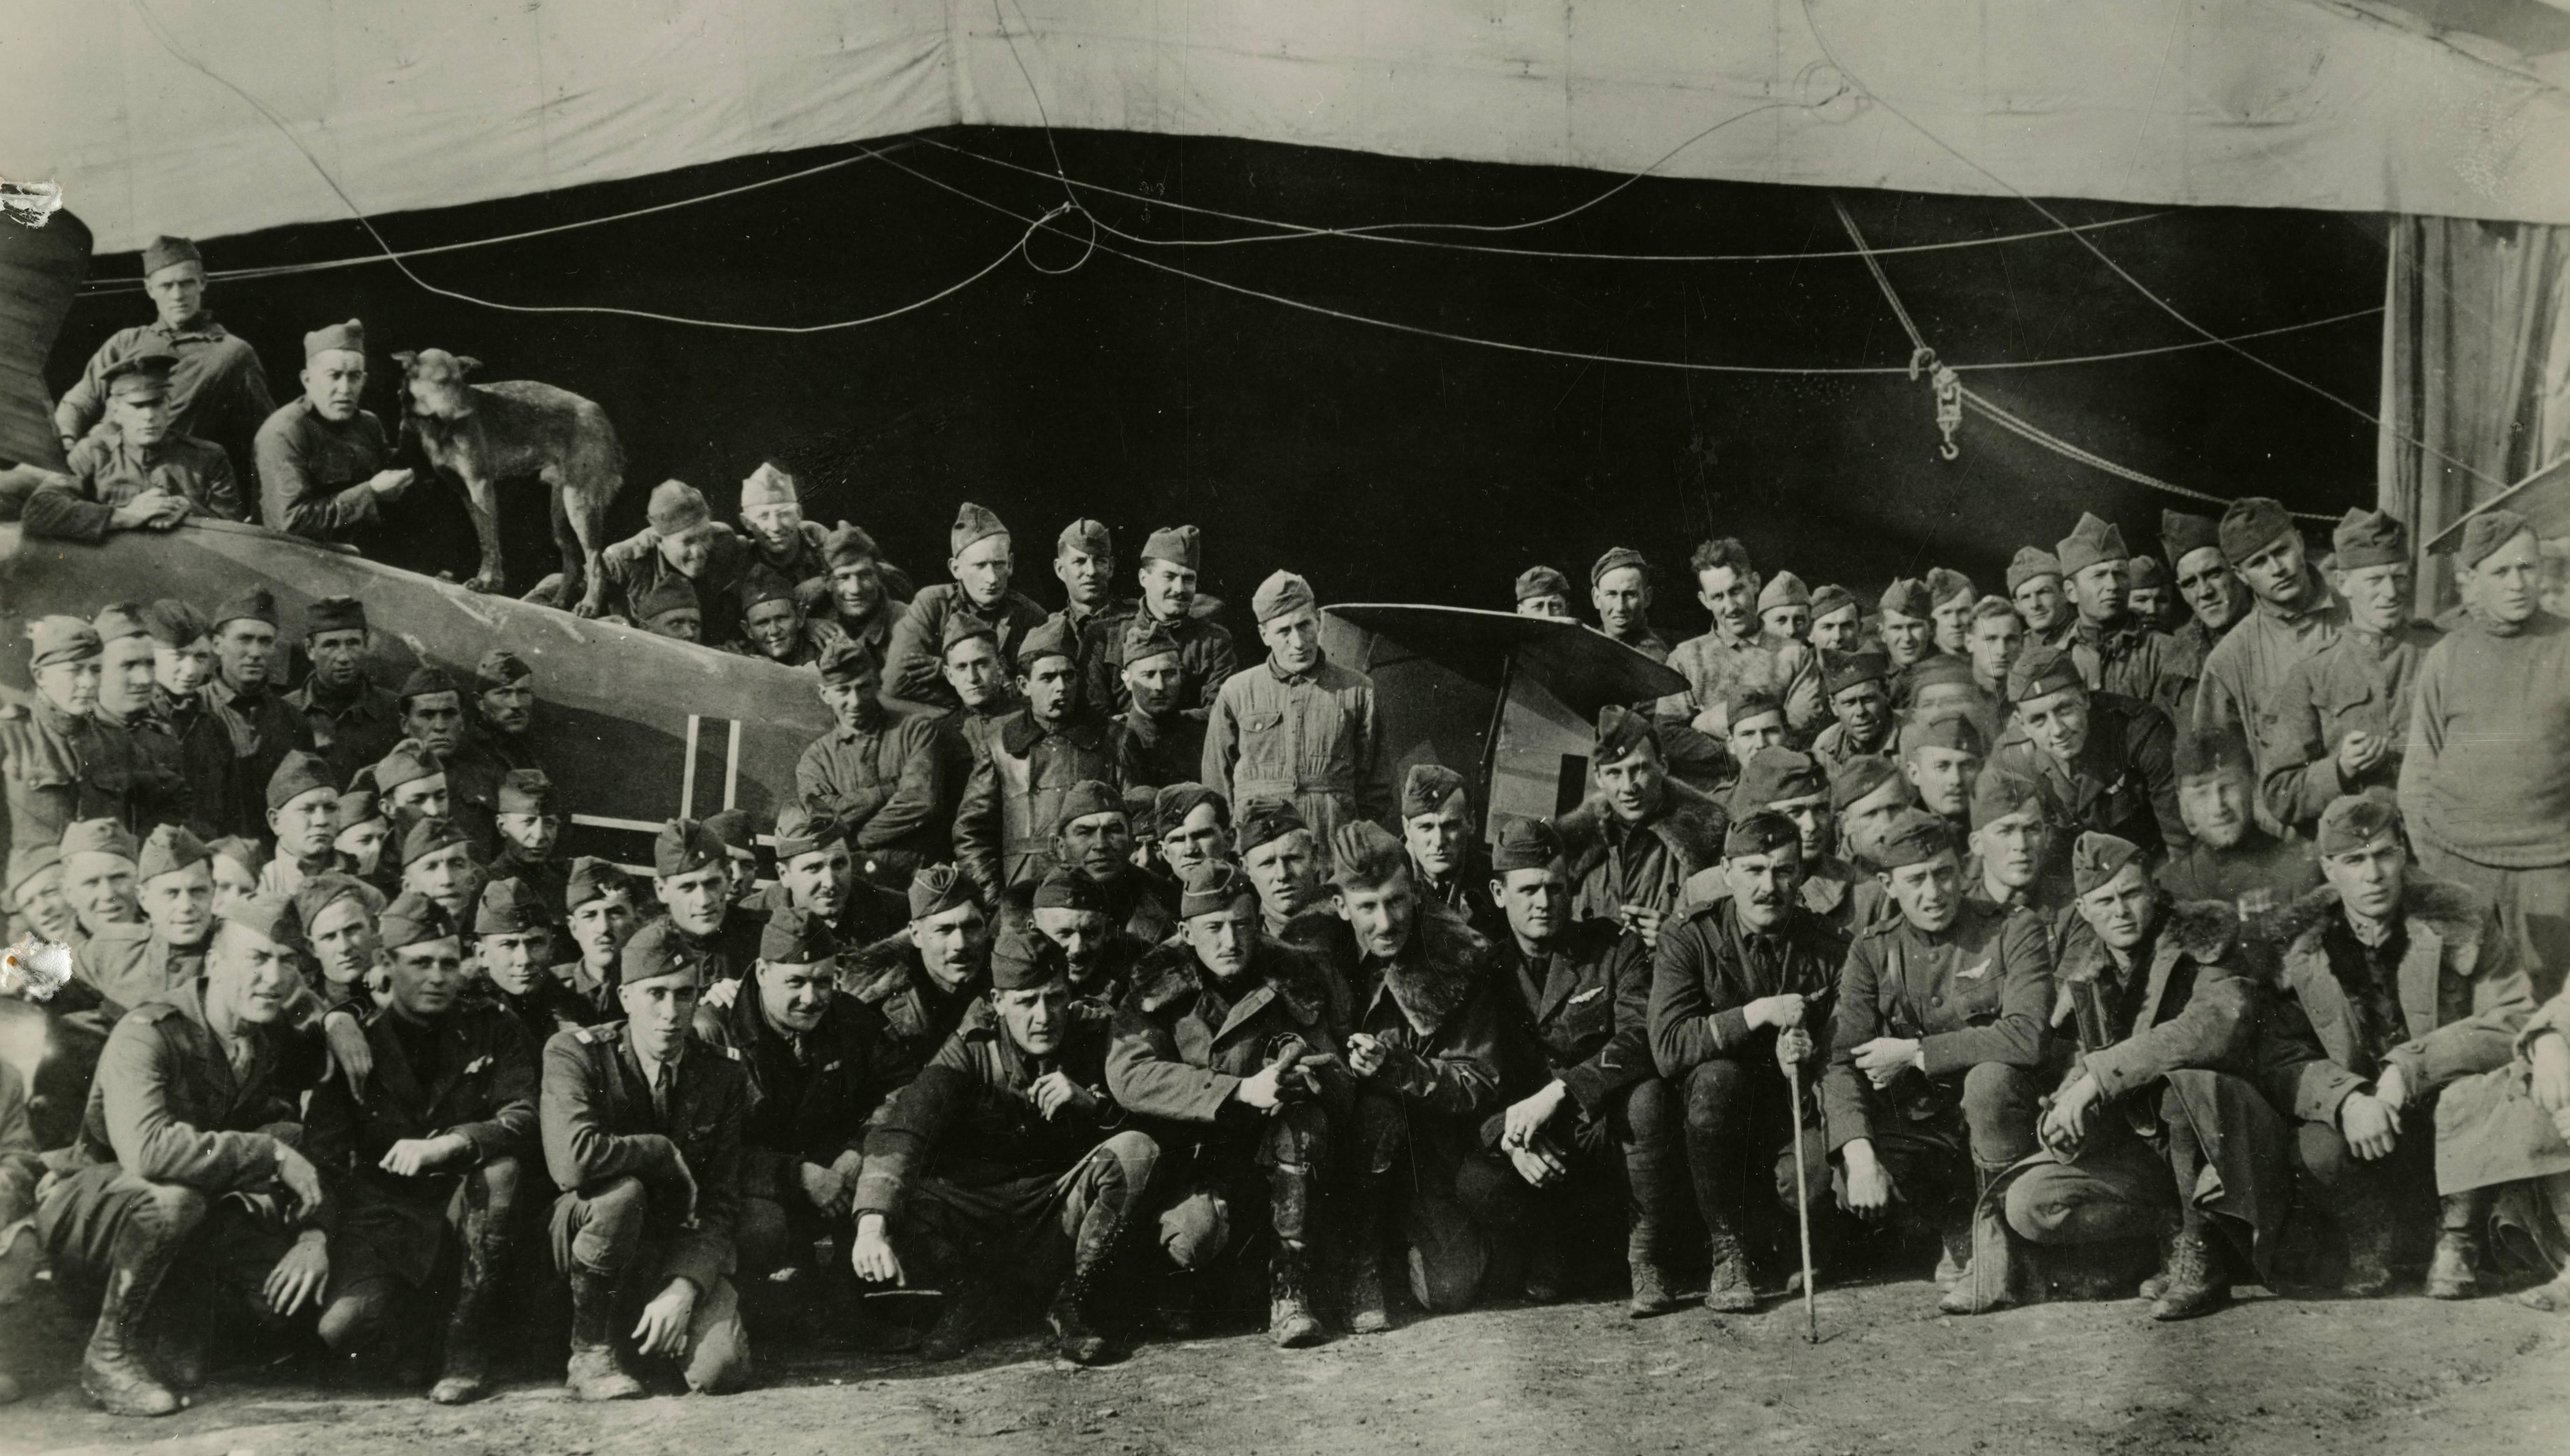 WWI World War One I Eddie Rickenbacker Photo In His Spad 94th Aero Squadron